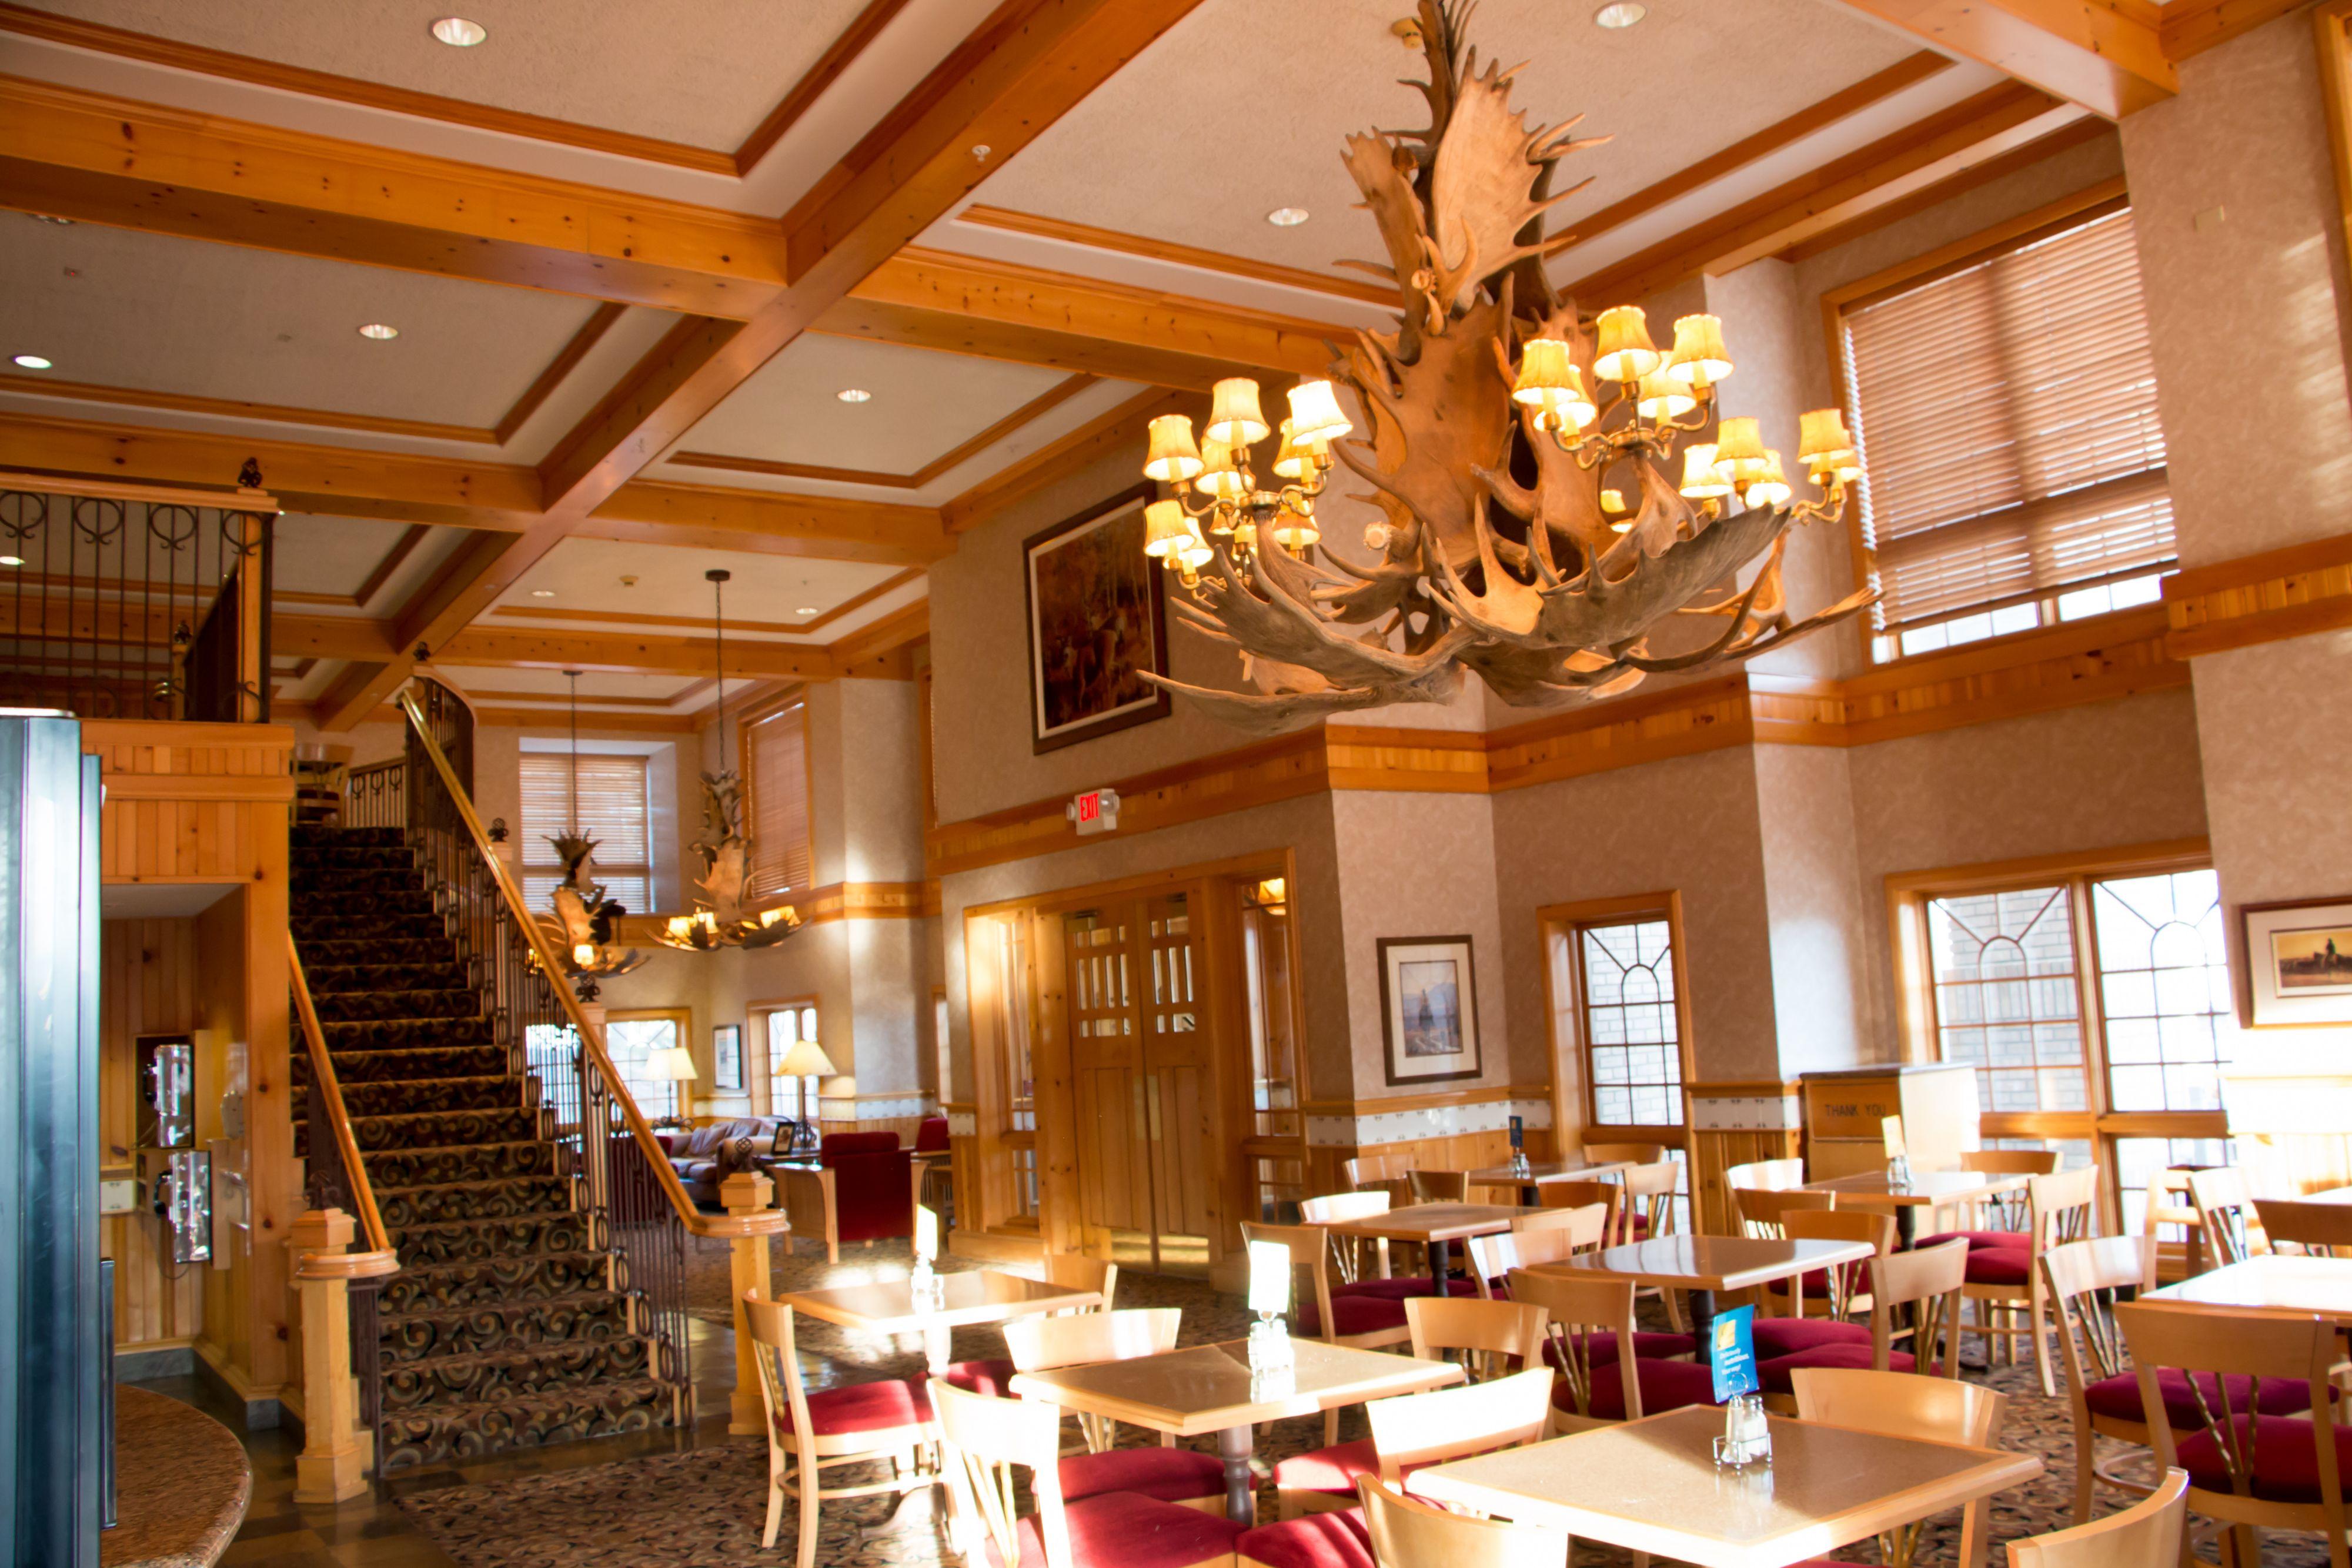 Holiday Inn Express & Suites Elko image 6